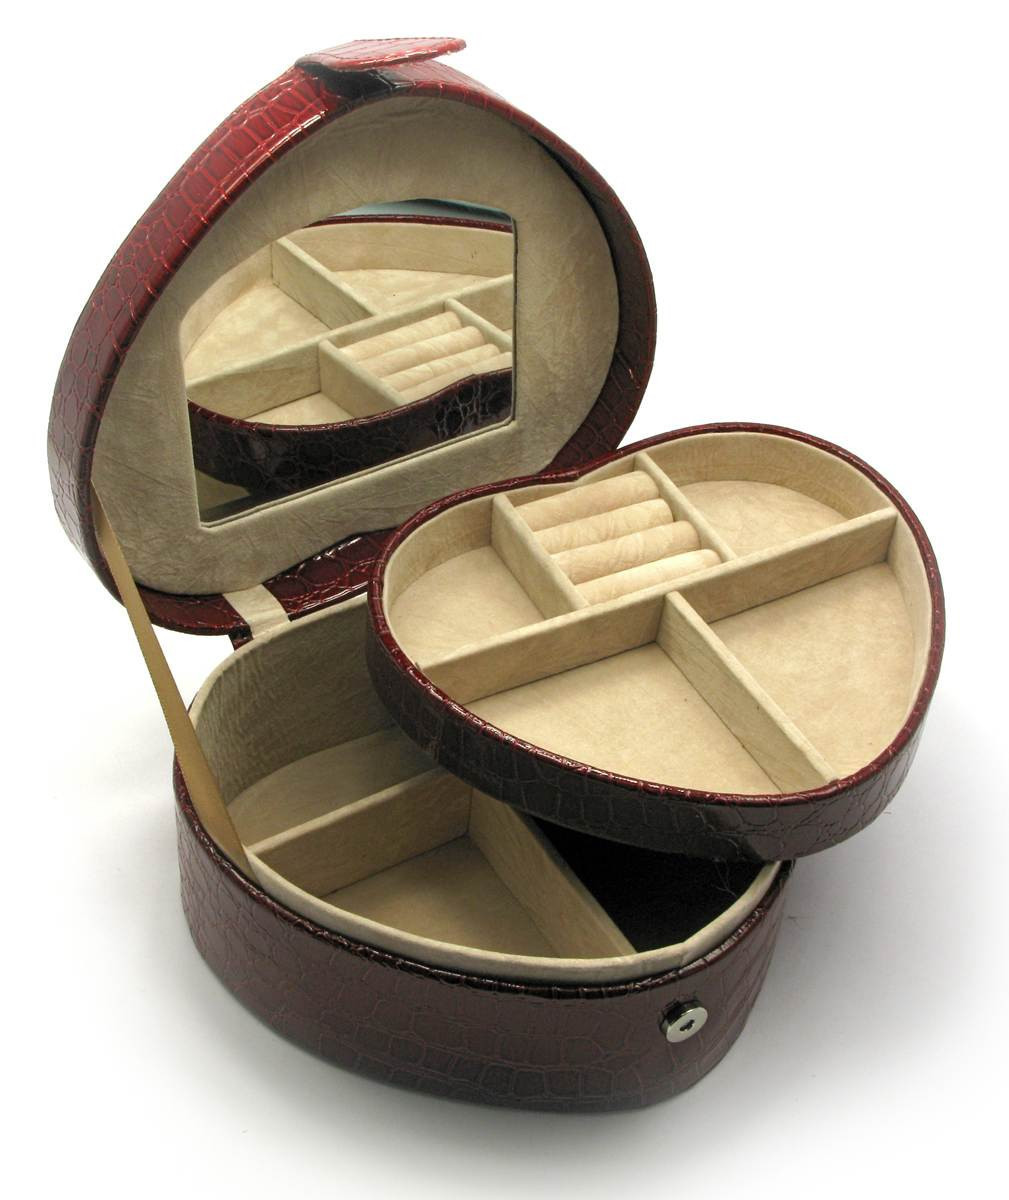 Скринька з висувними ящиками